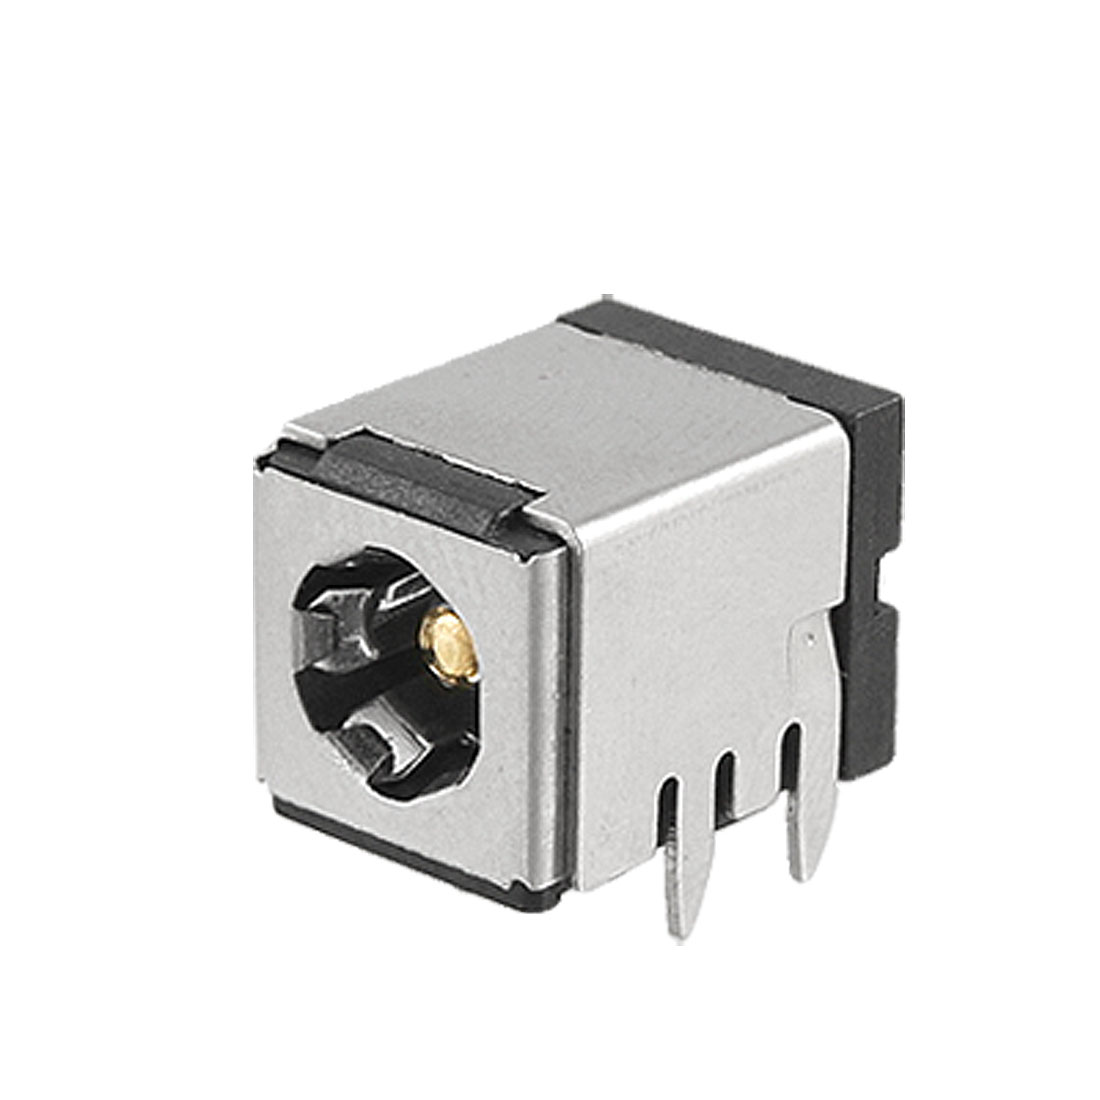 DC Power Jack Socket PJ018 2.5mm for Gateway 3000 6000 Series